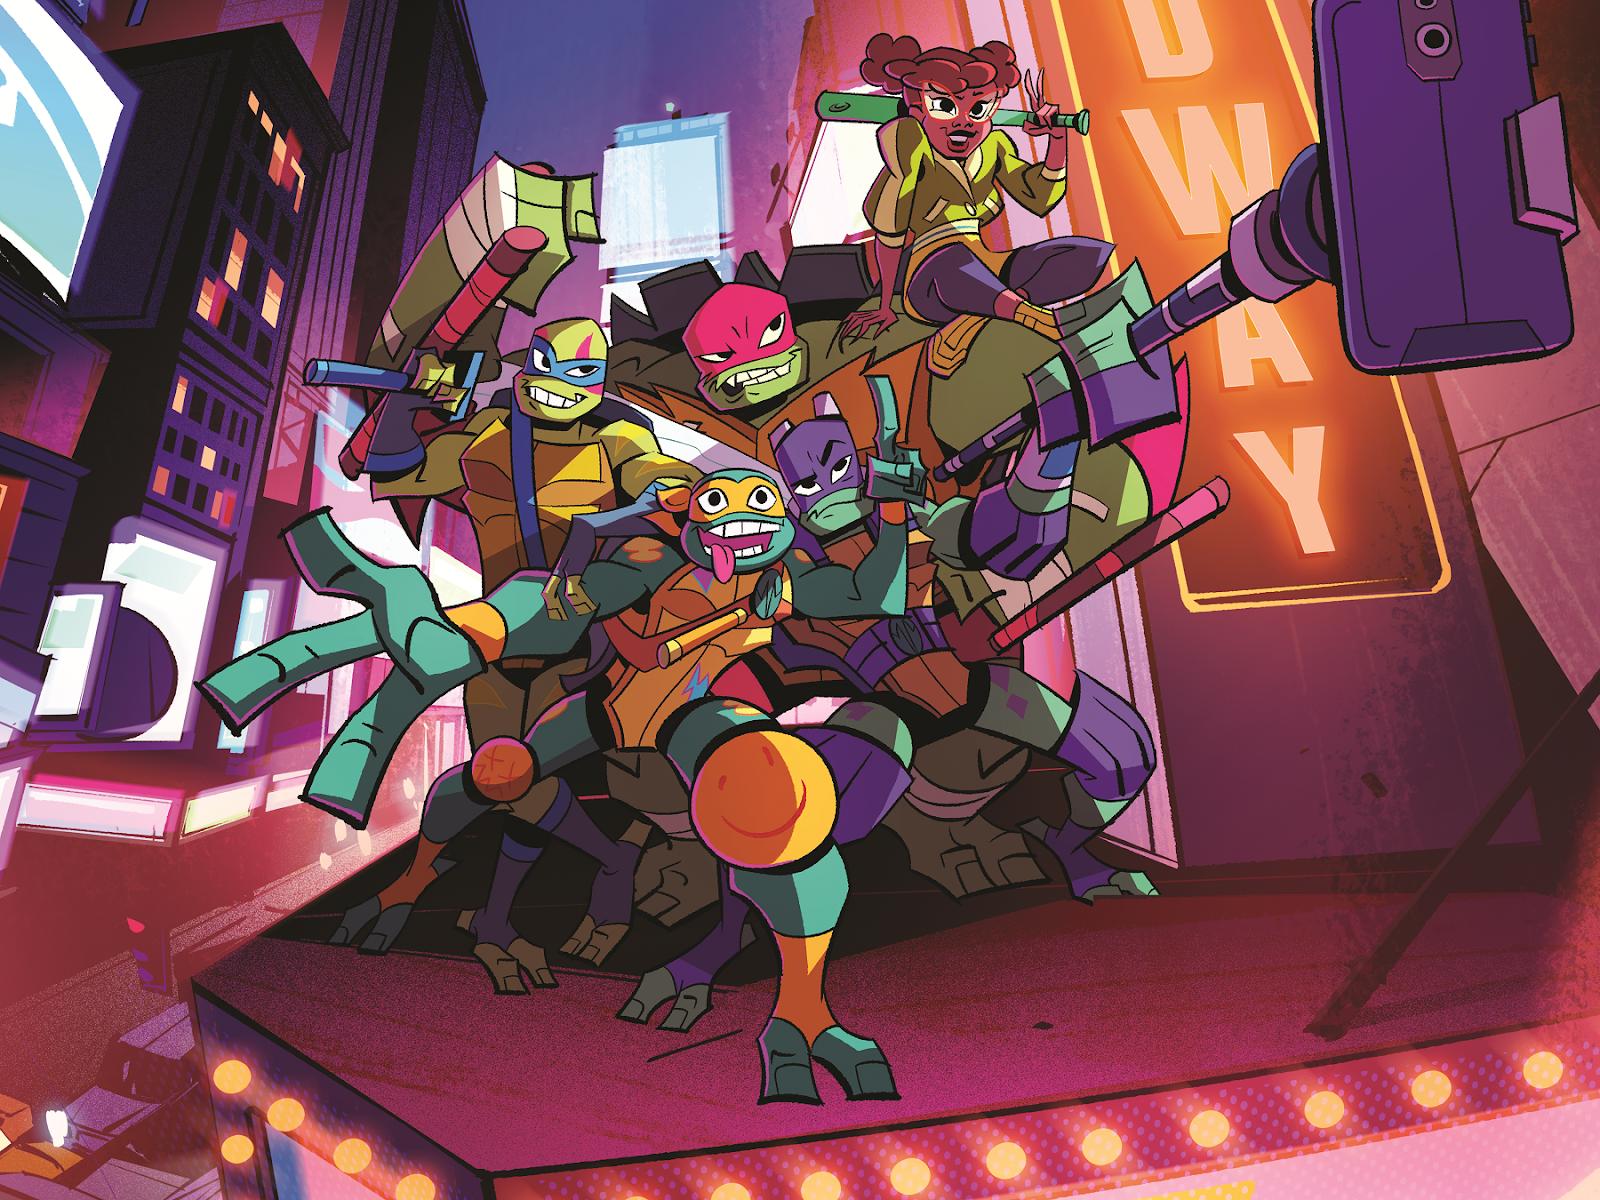 \ Nickelodeon Rise of the Teenage Mutant Ninja Turtles Leonardo NEW Comme neuf sur Scellé carte